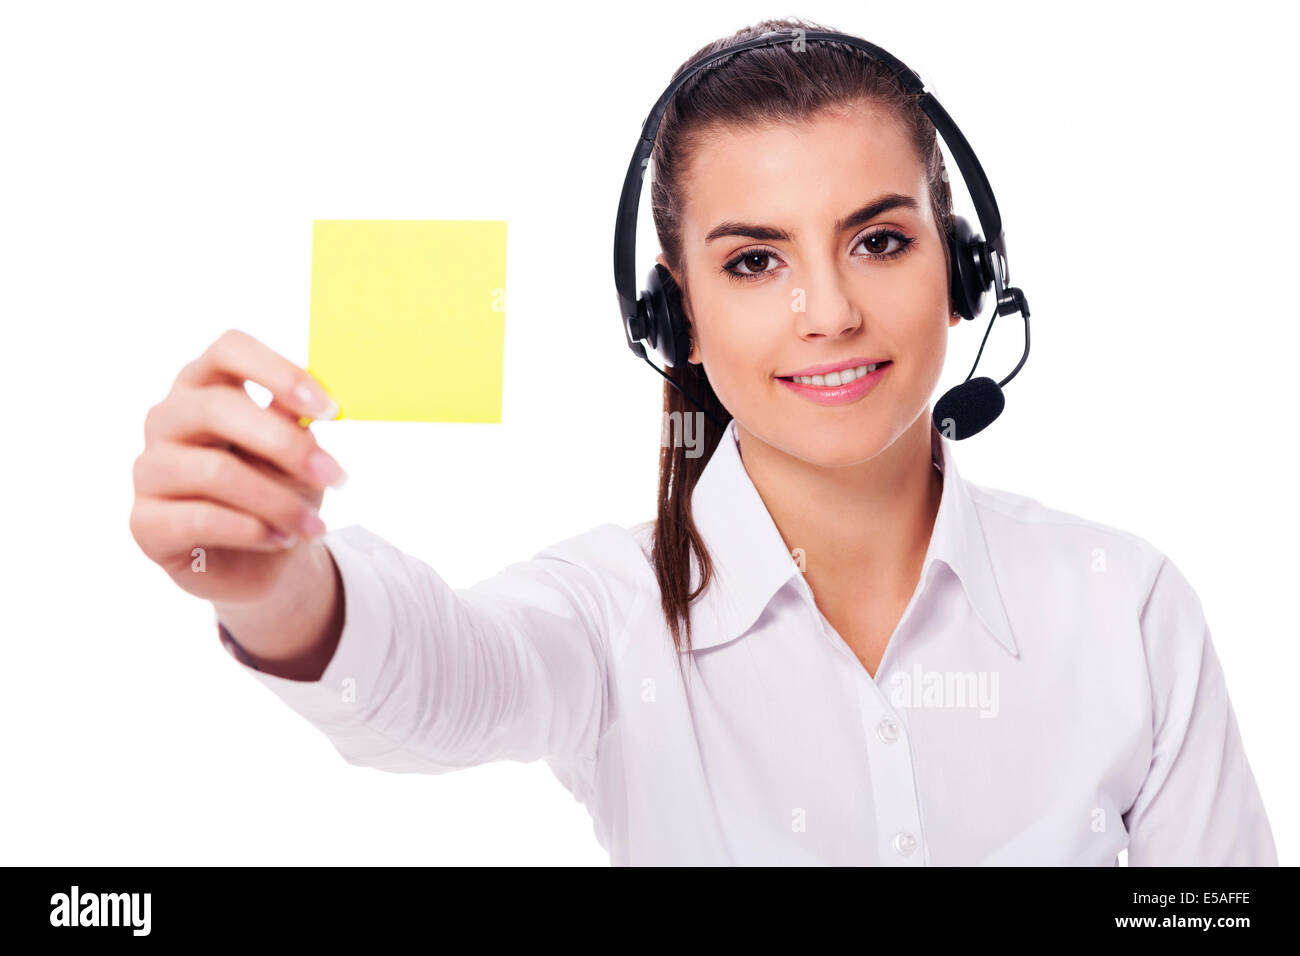 Female operator holding yellow note, Debica, Poland - Stock Image